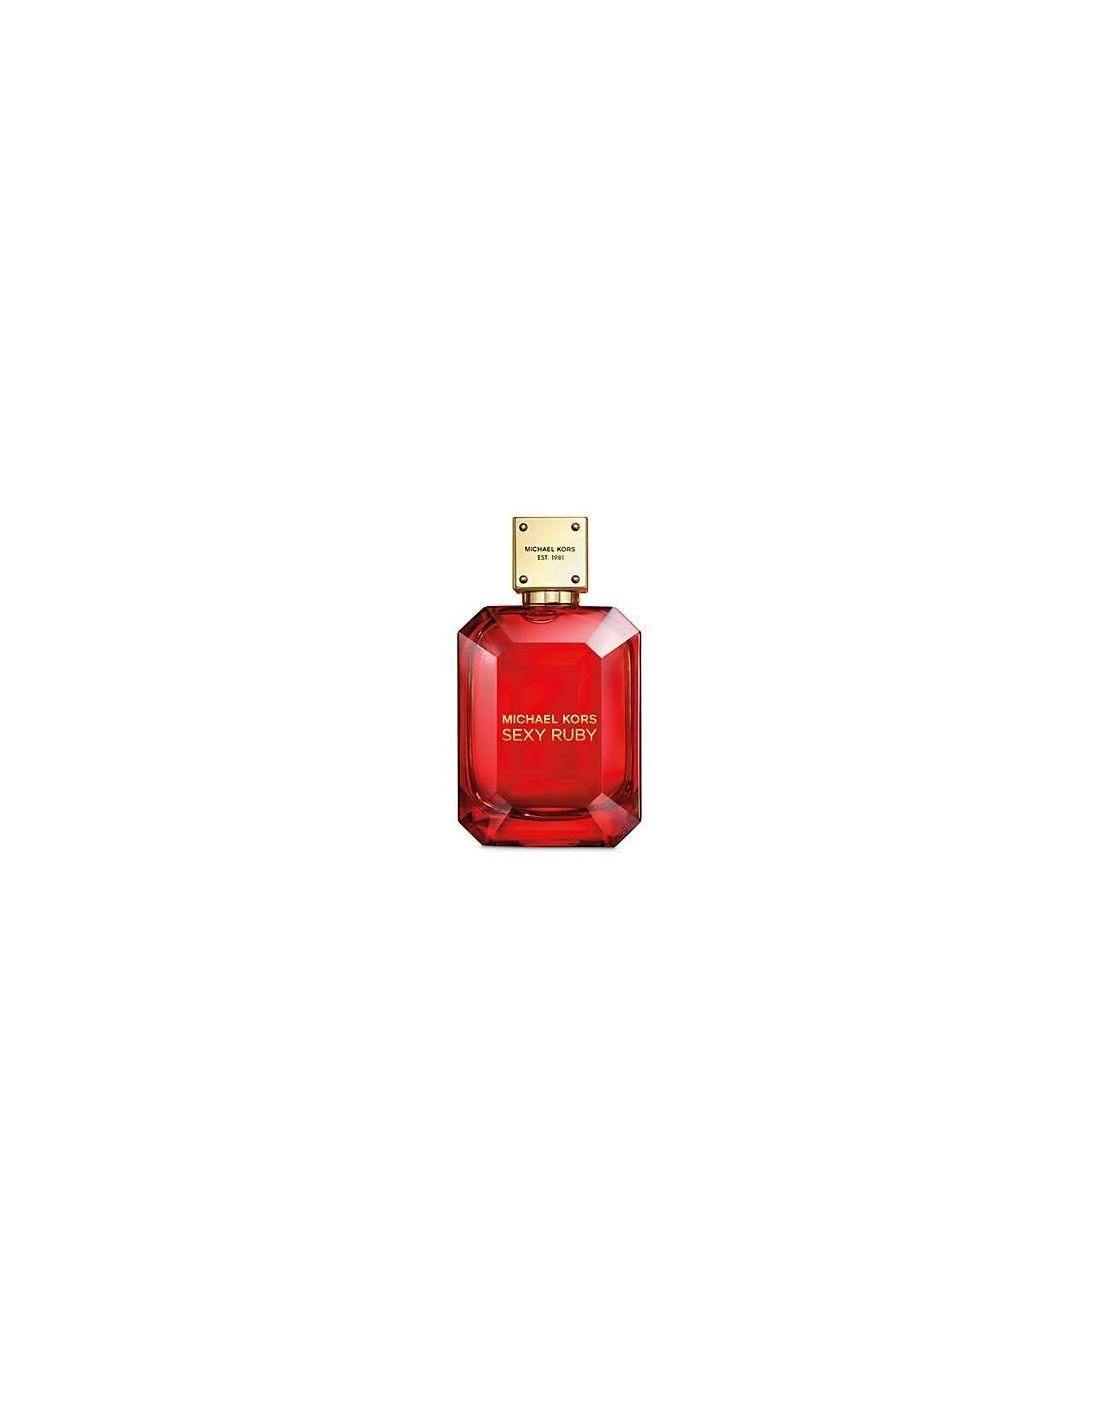 7ebe4f8f9 Michael Kors Sexy Ruby Eau de Parfum 50 ml à venda na Perfumes 24 ...